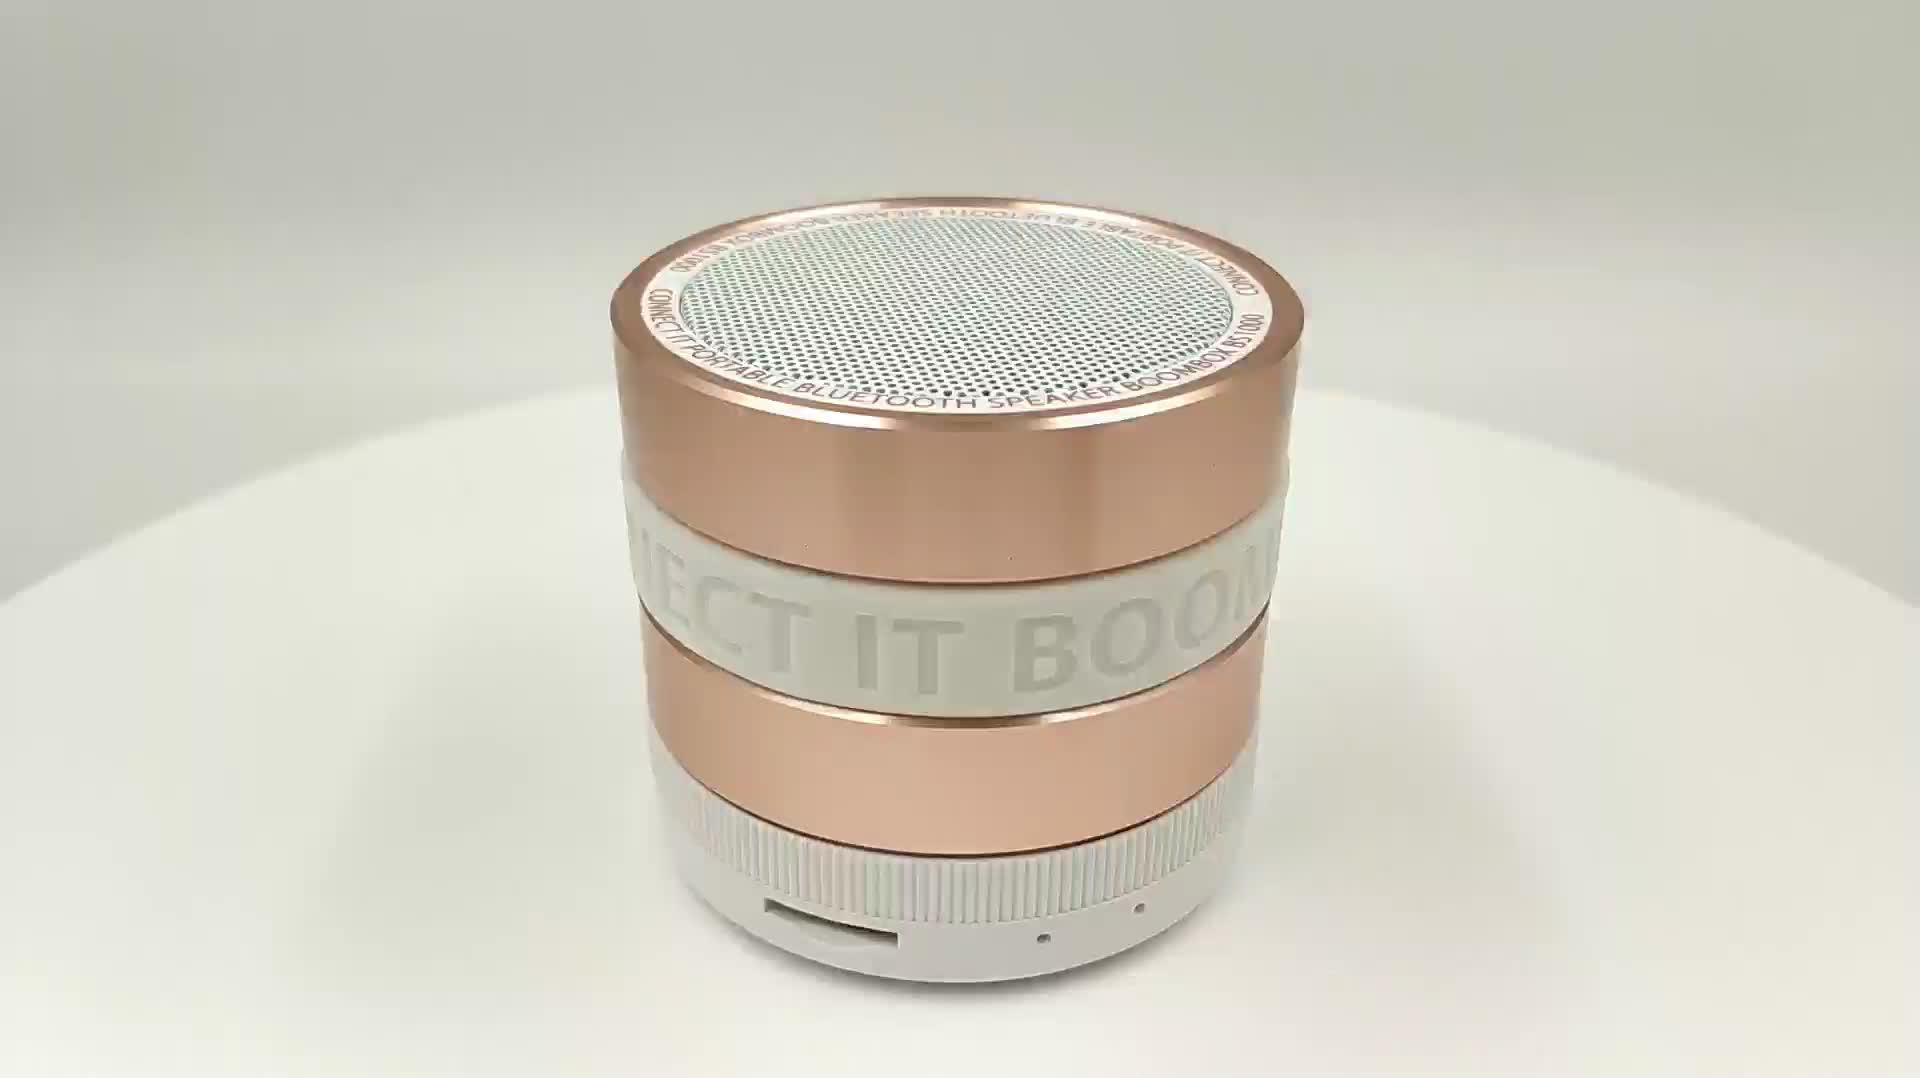 Speakers Wireless Very 2017 Best Klinke Logo Bluetooth Speaker Akku For Mobile With Usb/sd